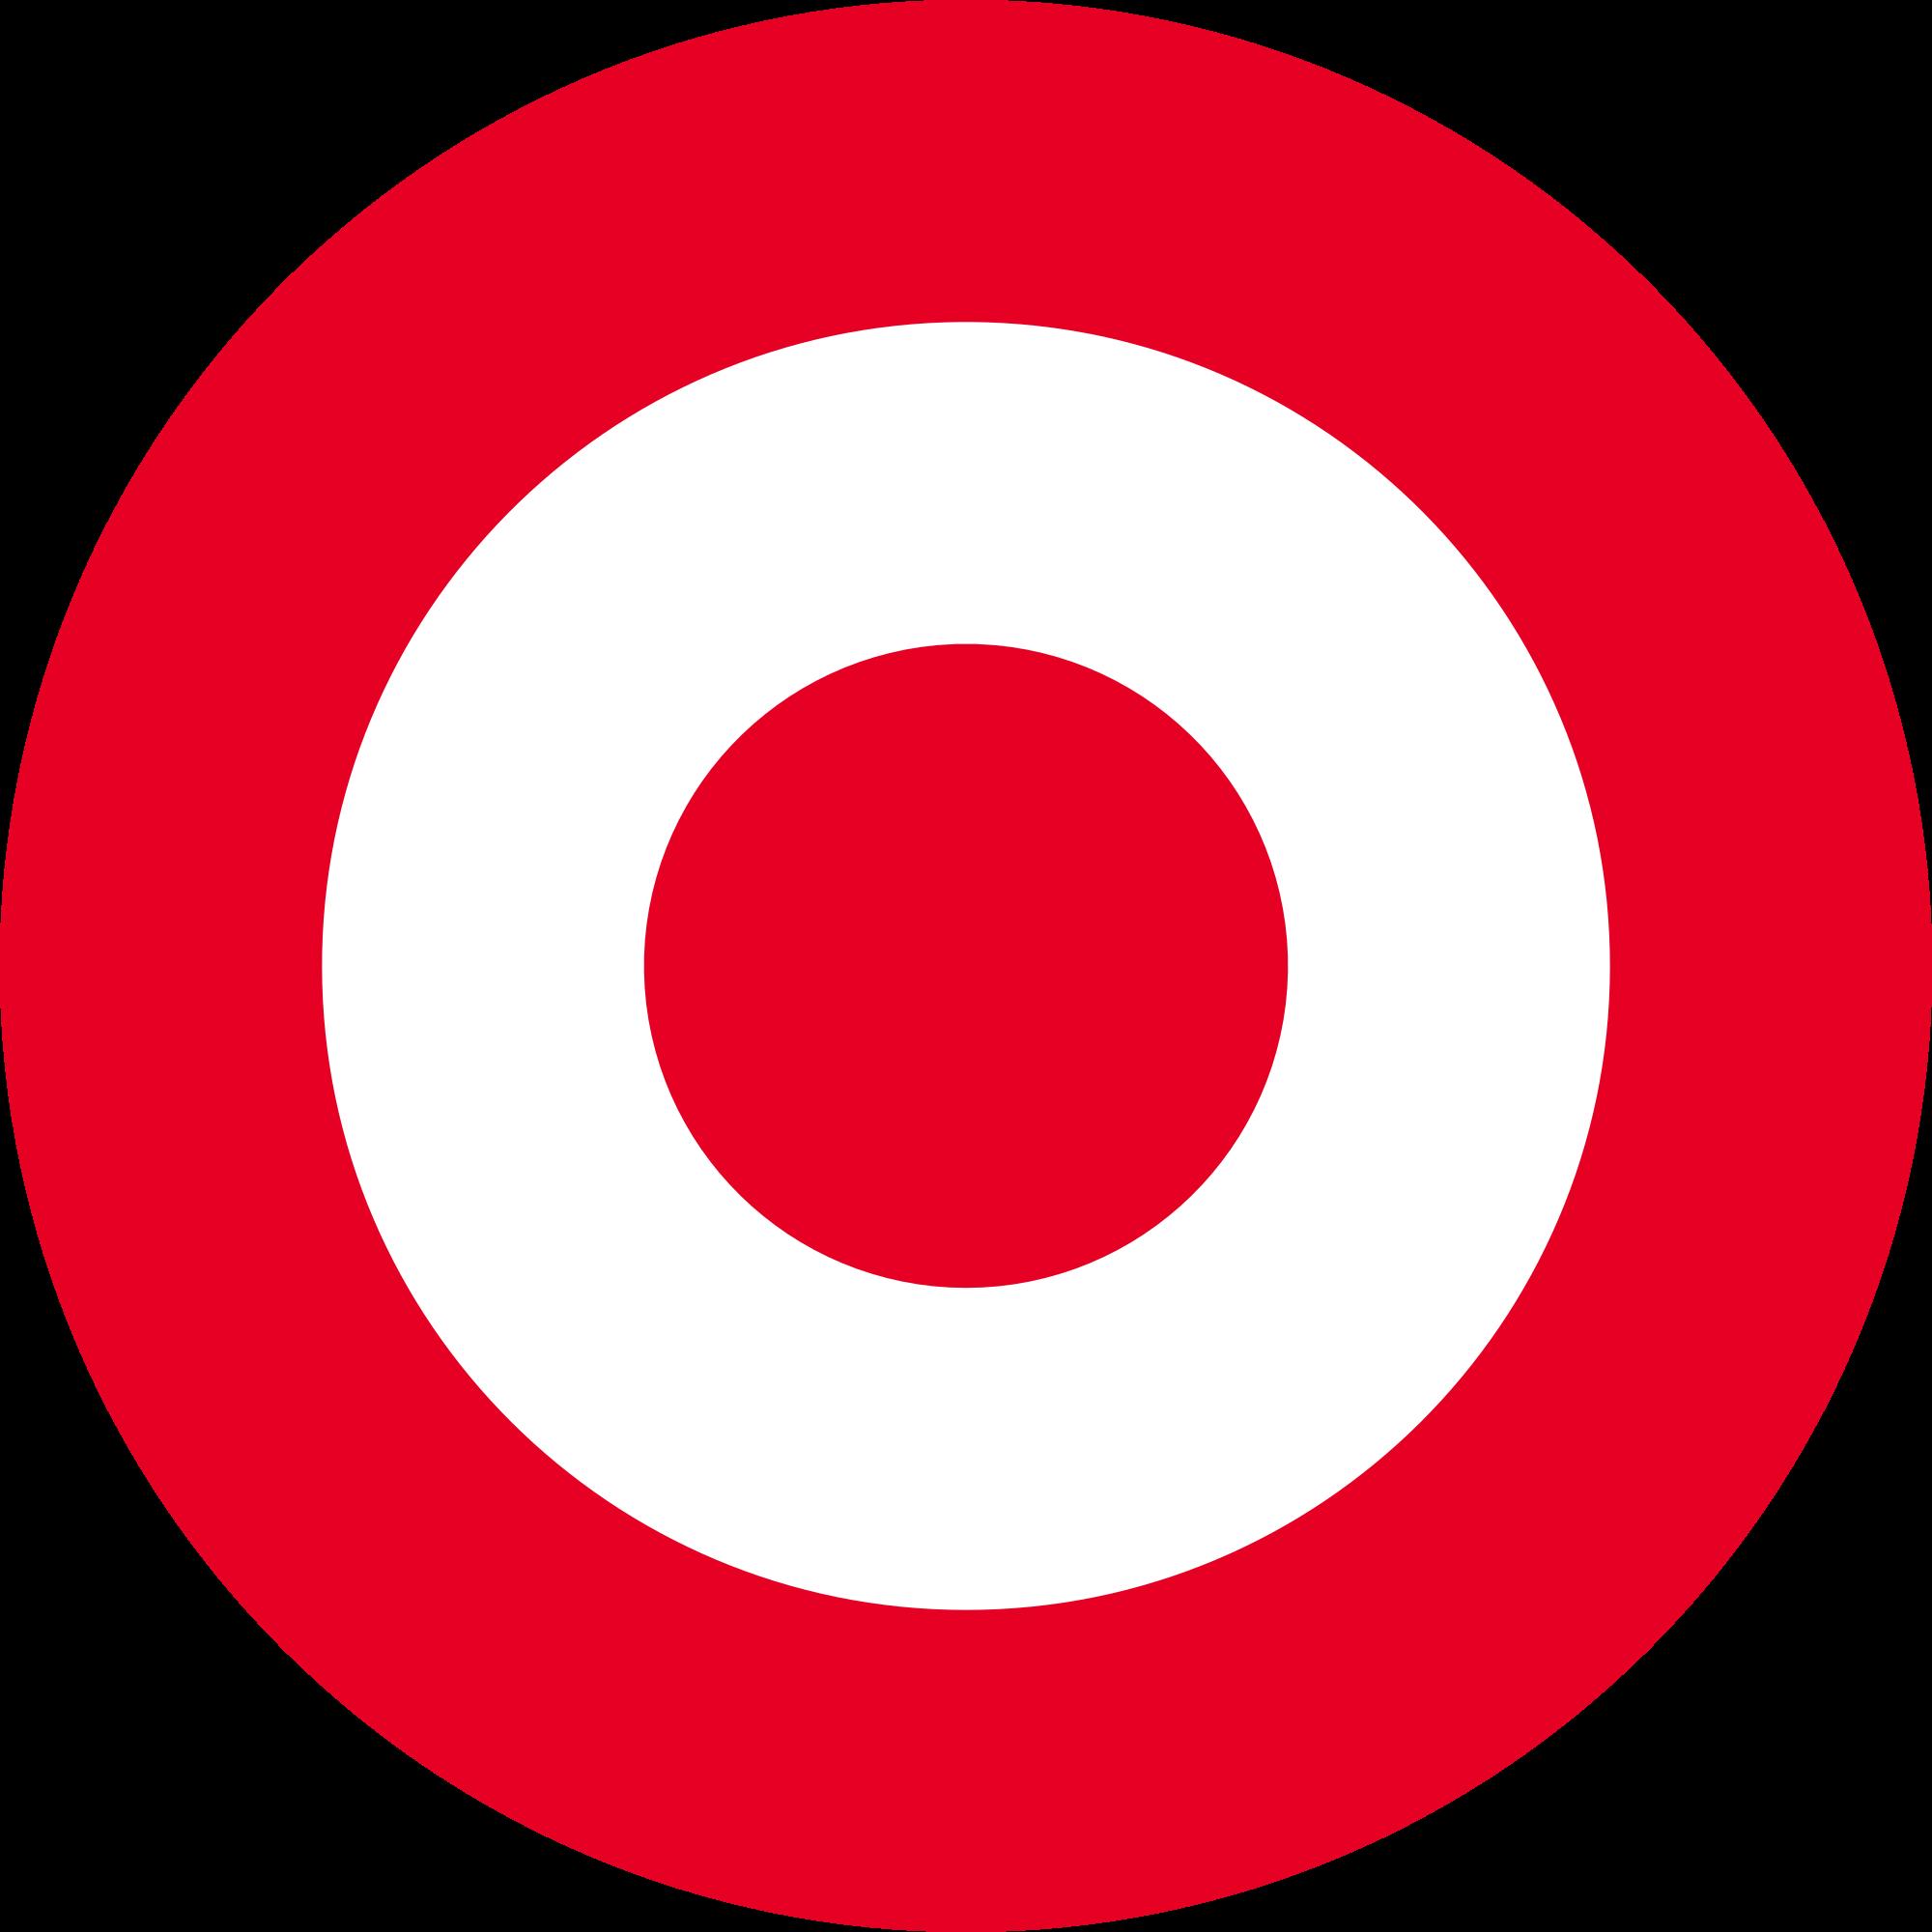 Target_Corporation_logo